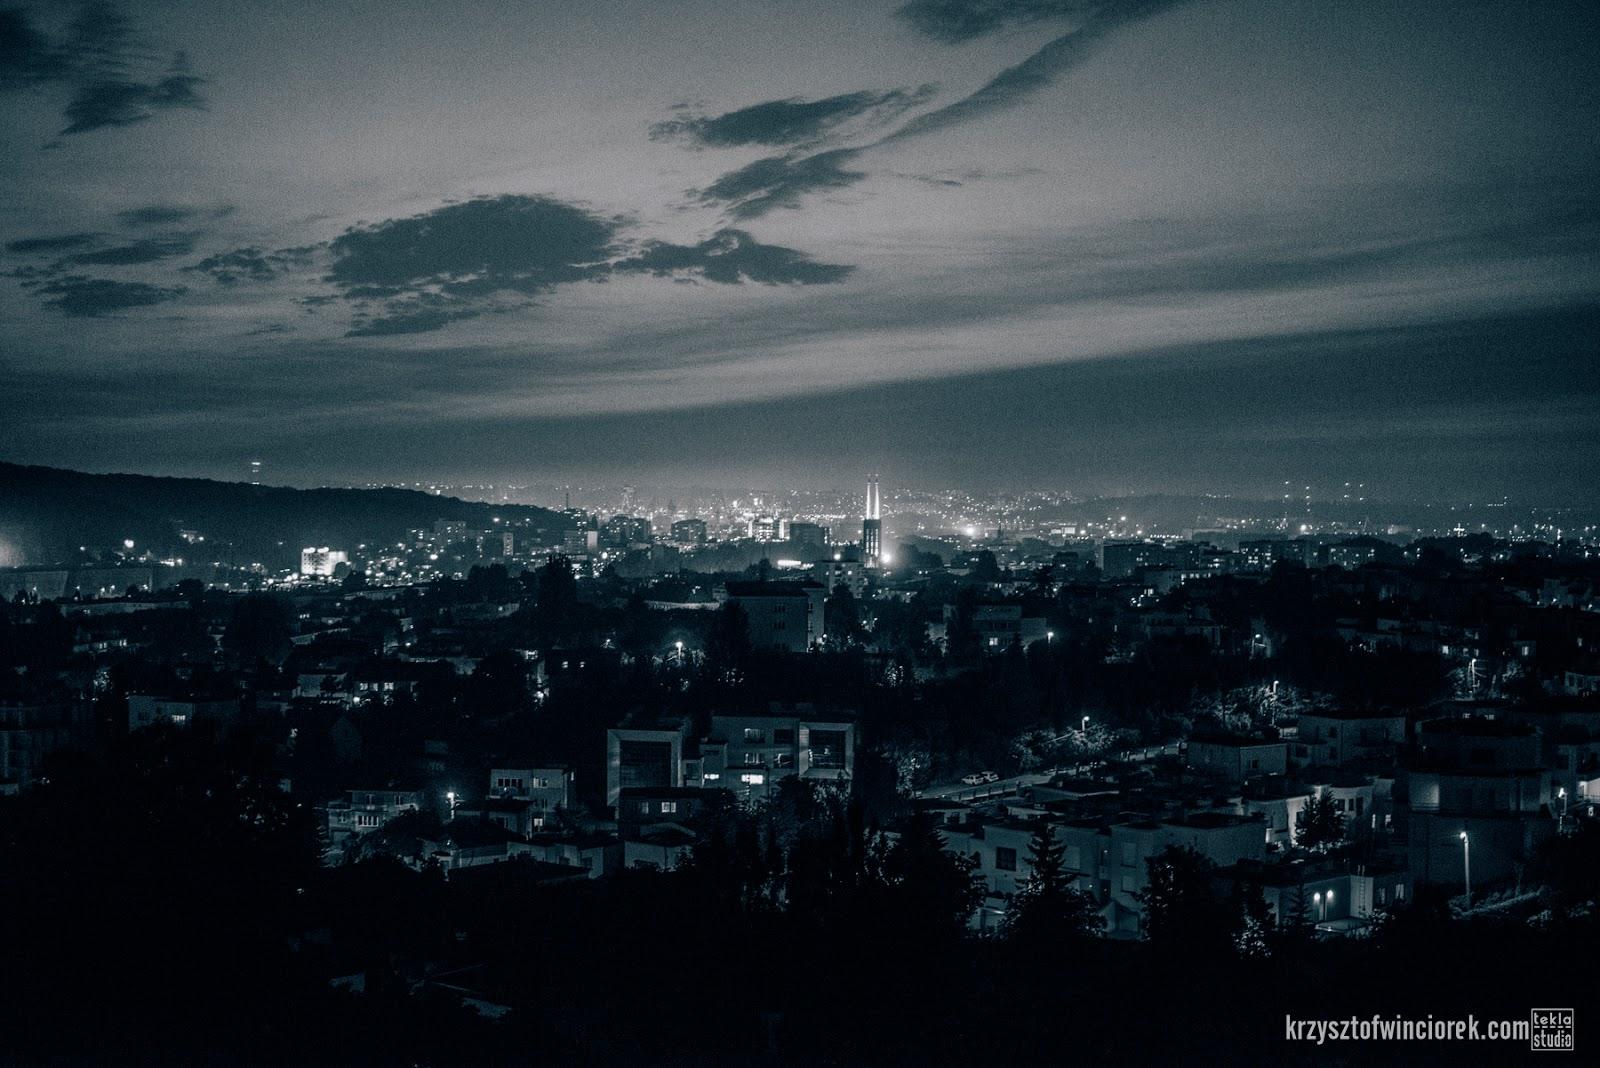 Night from Redłowo